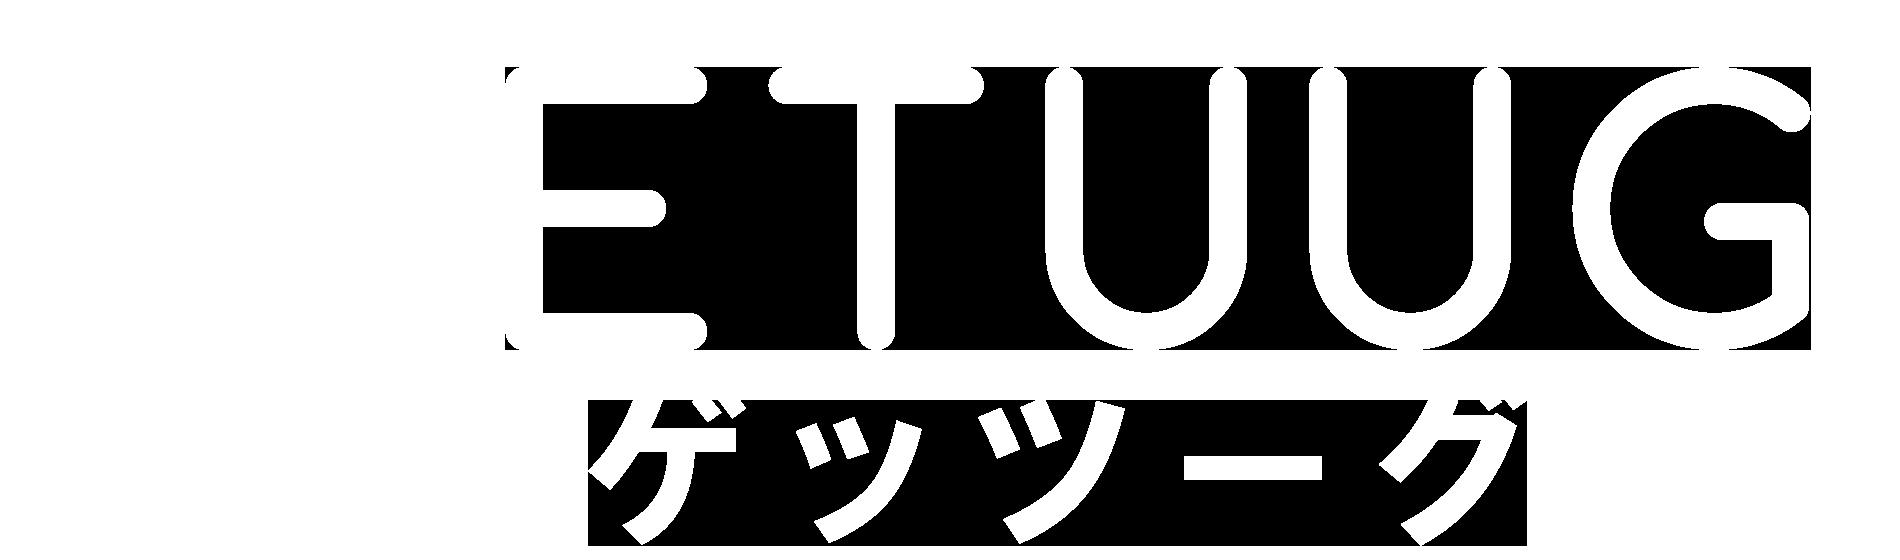 GETUUG(ゲッツーグ)